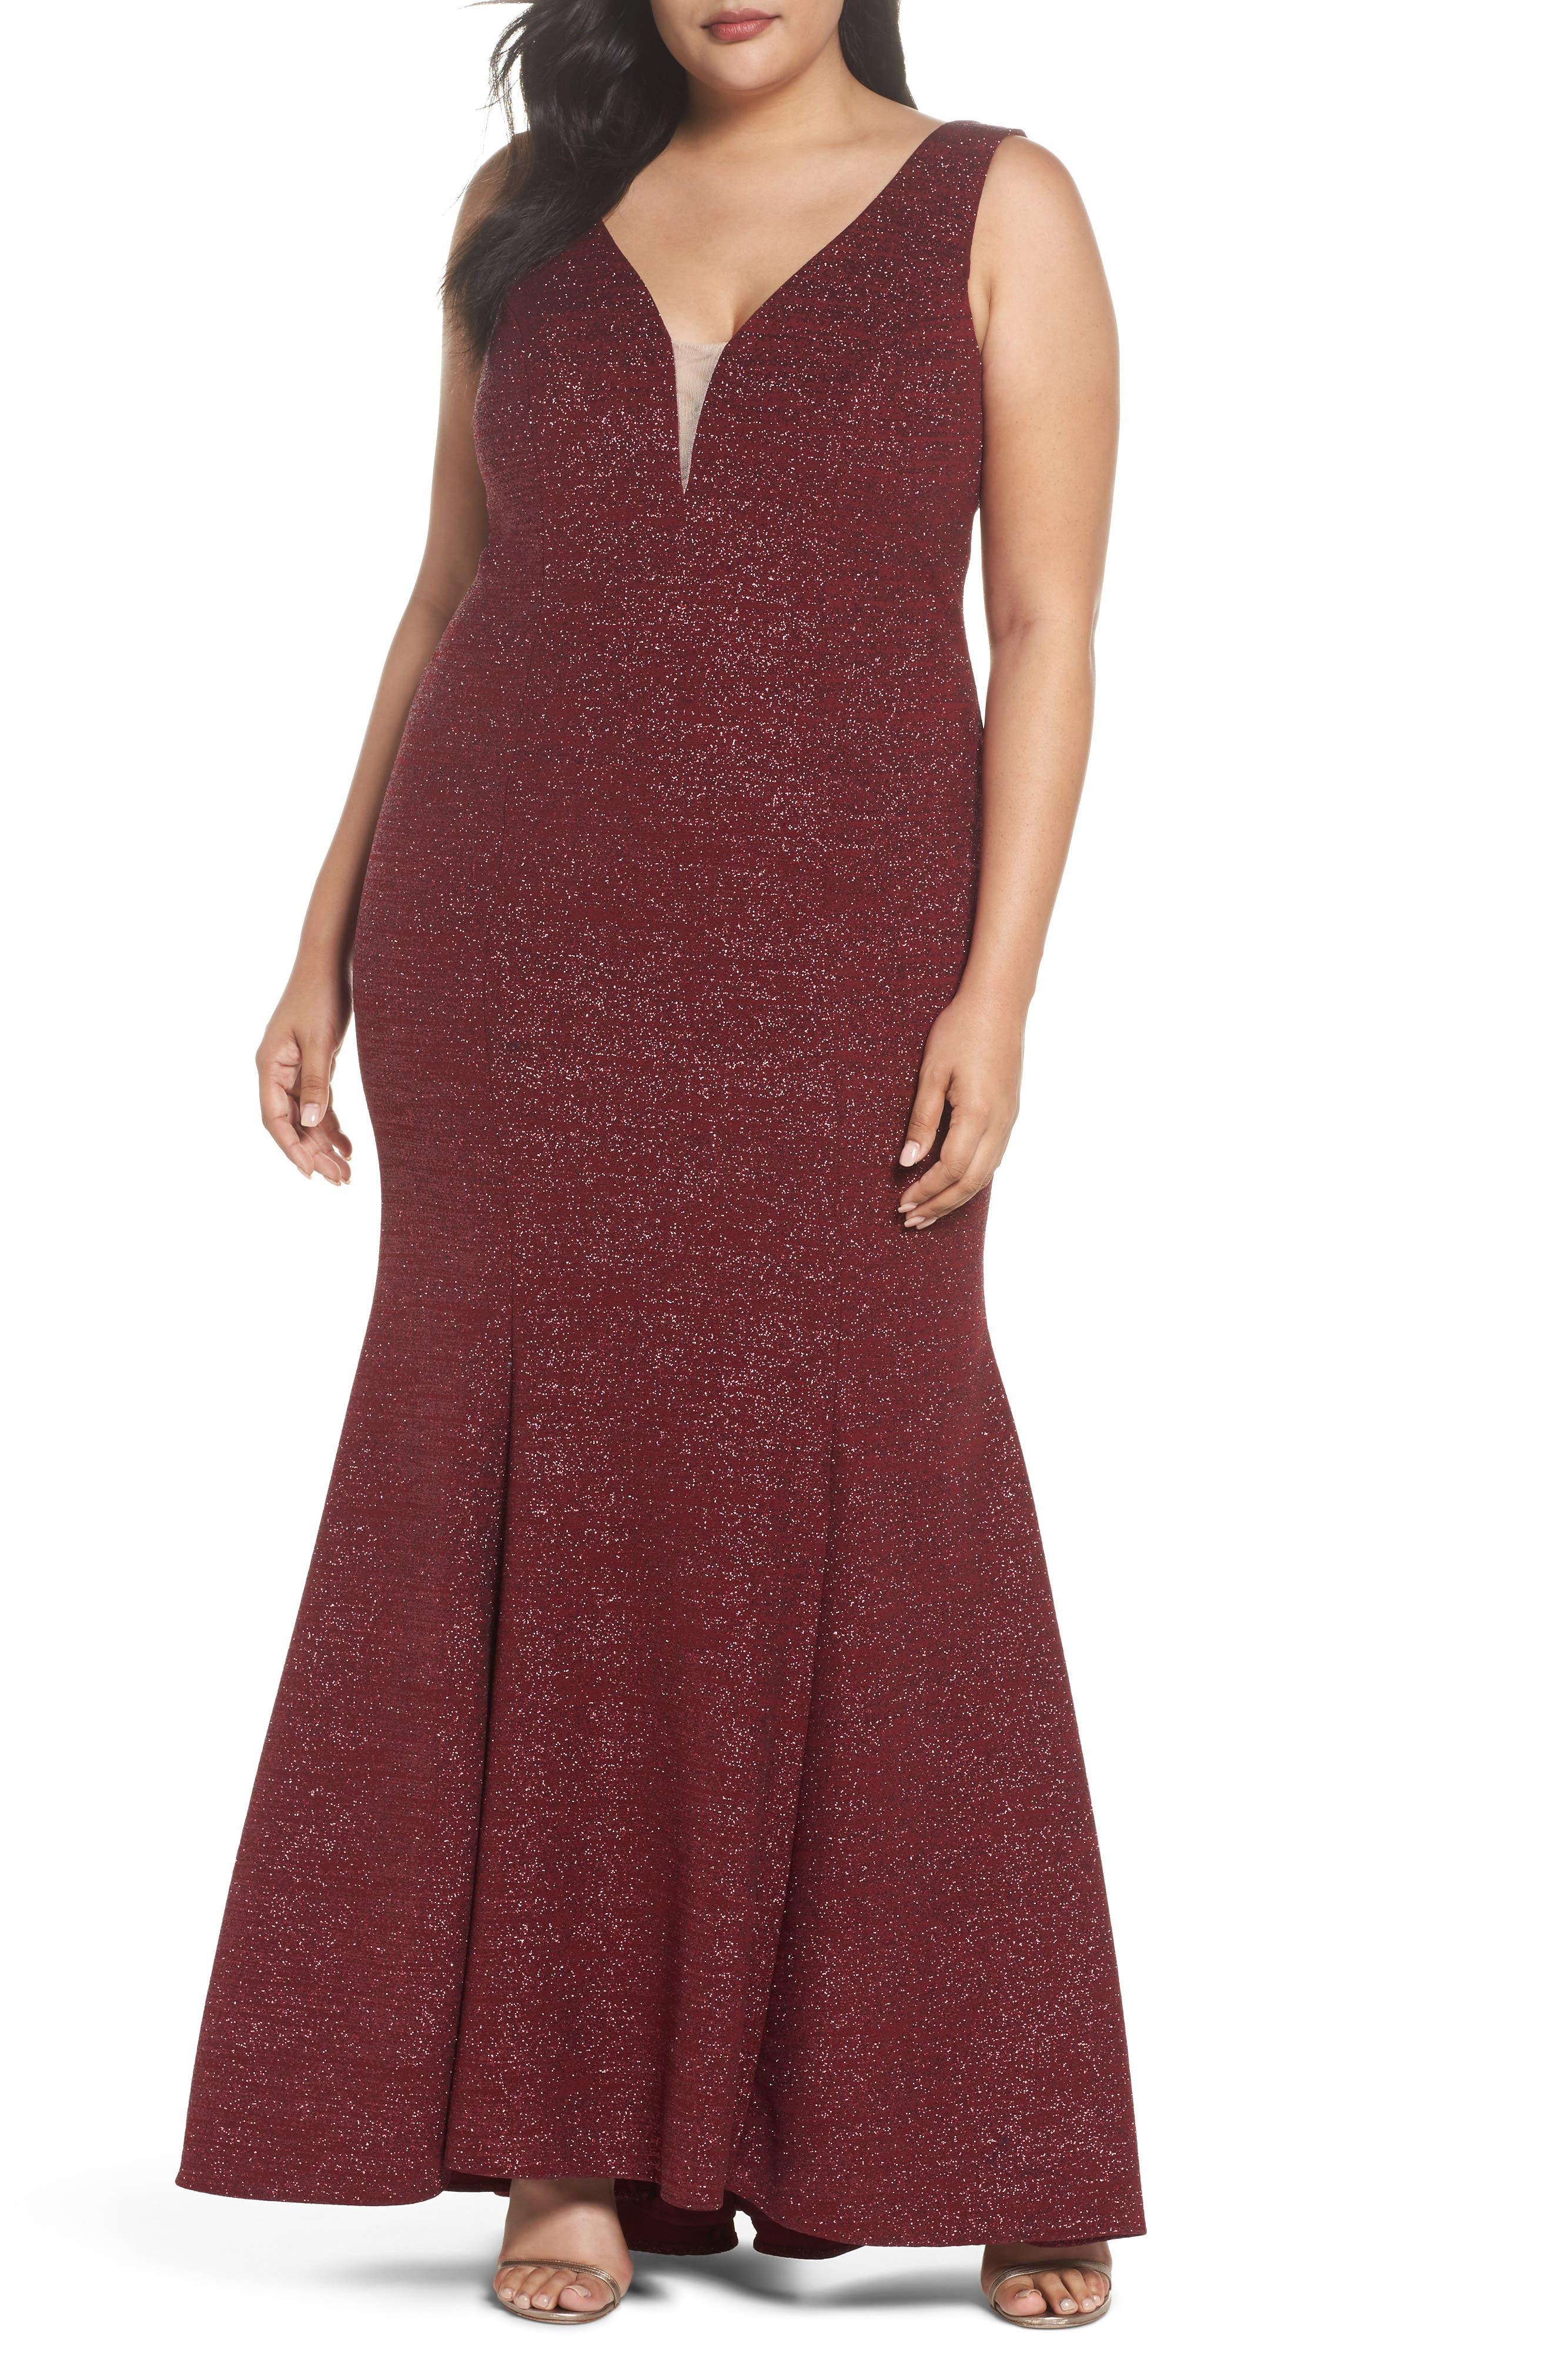 Main Image - Xscape Metallic Knit Mermaid Gown (Plus Size)